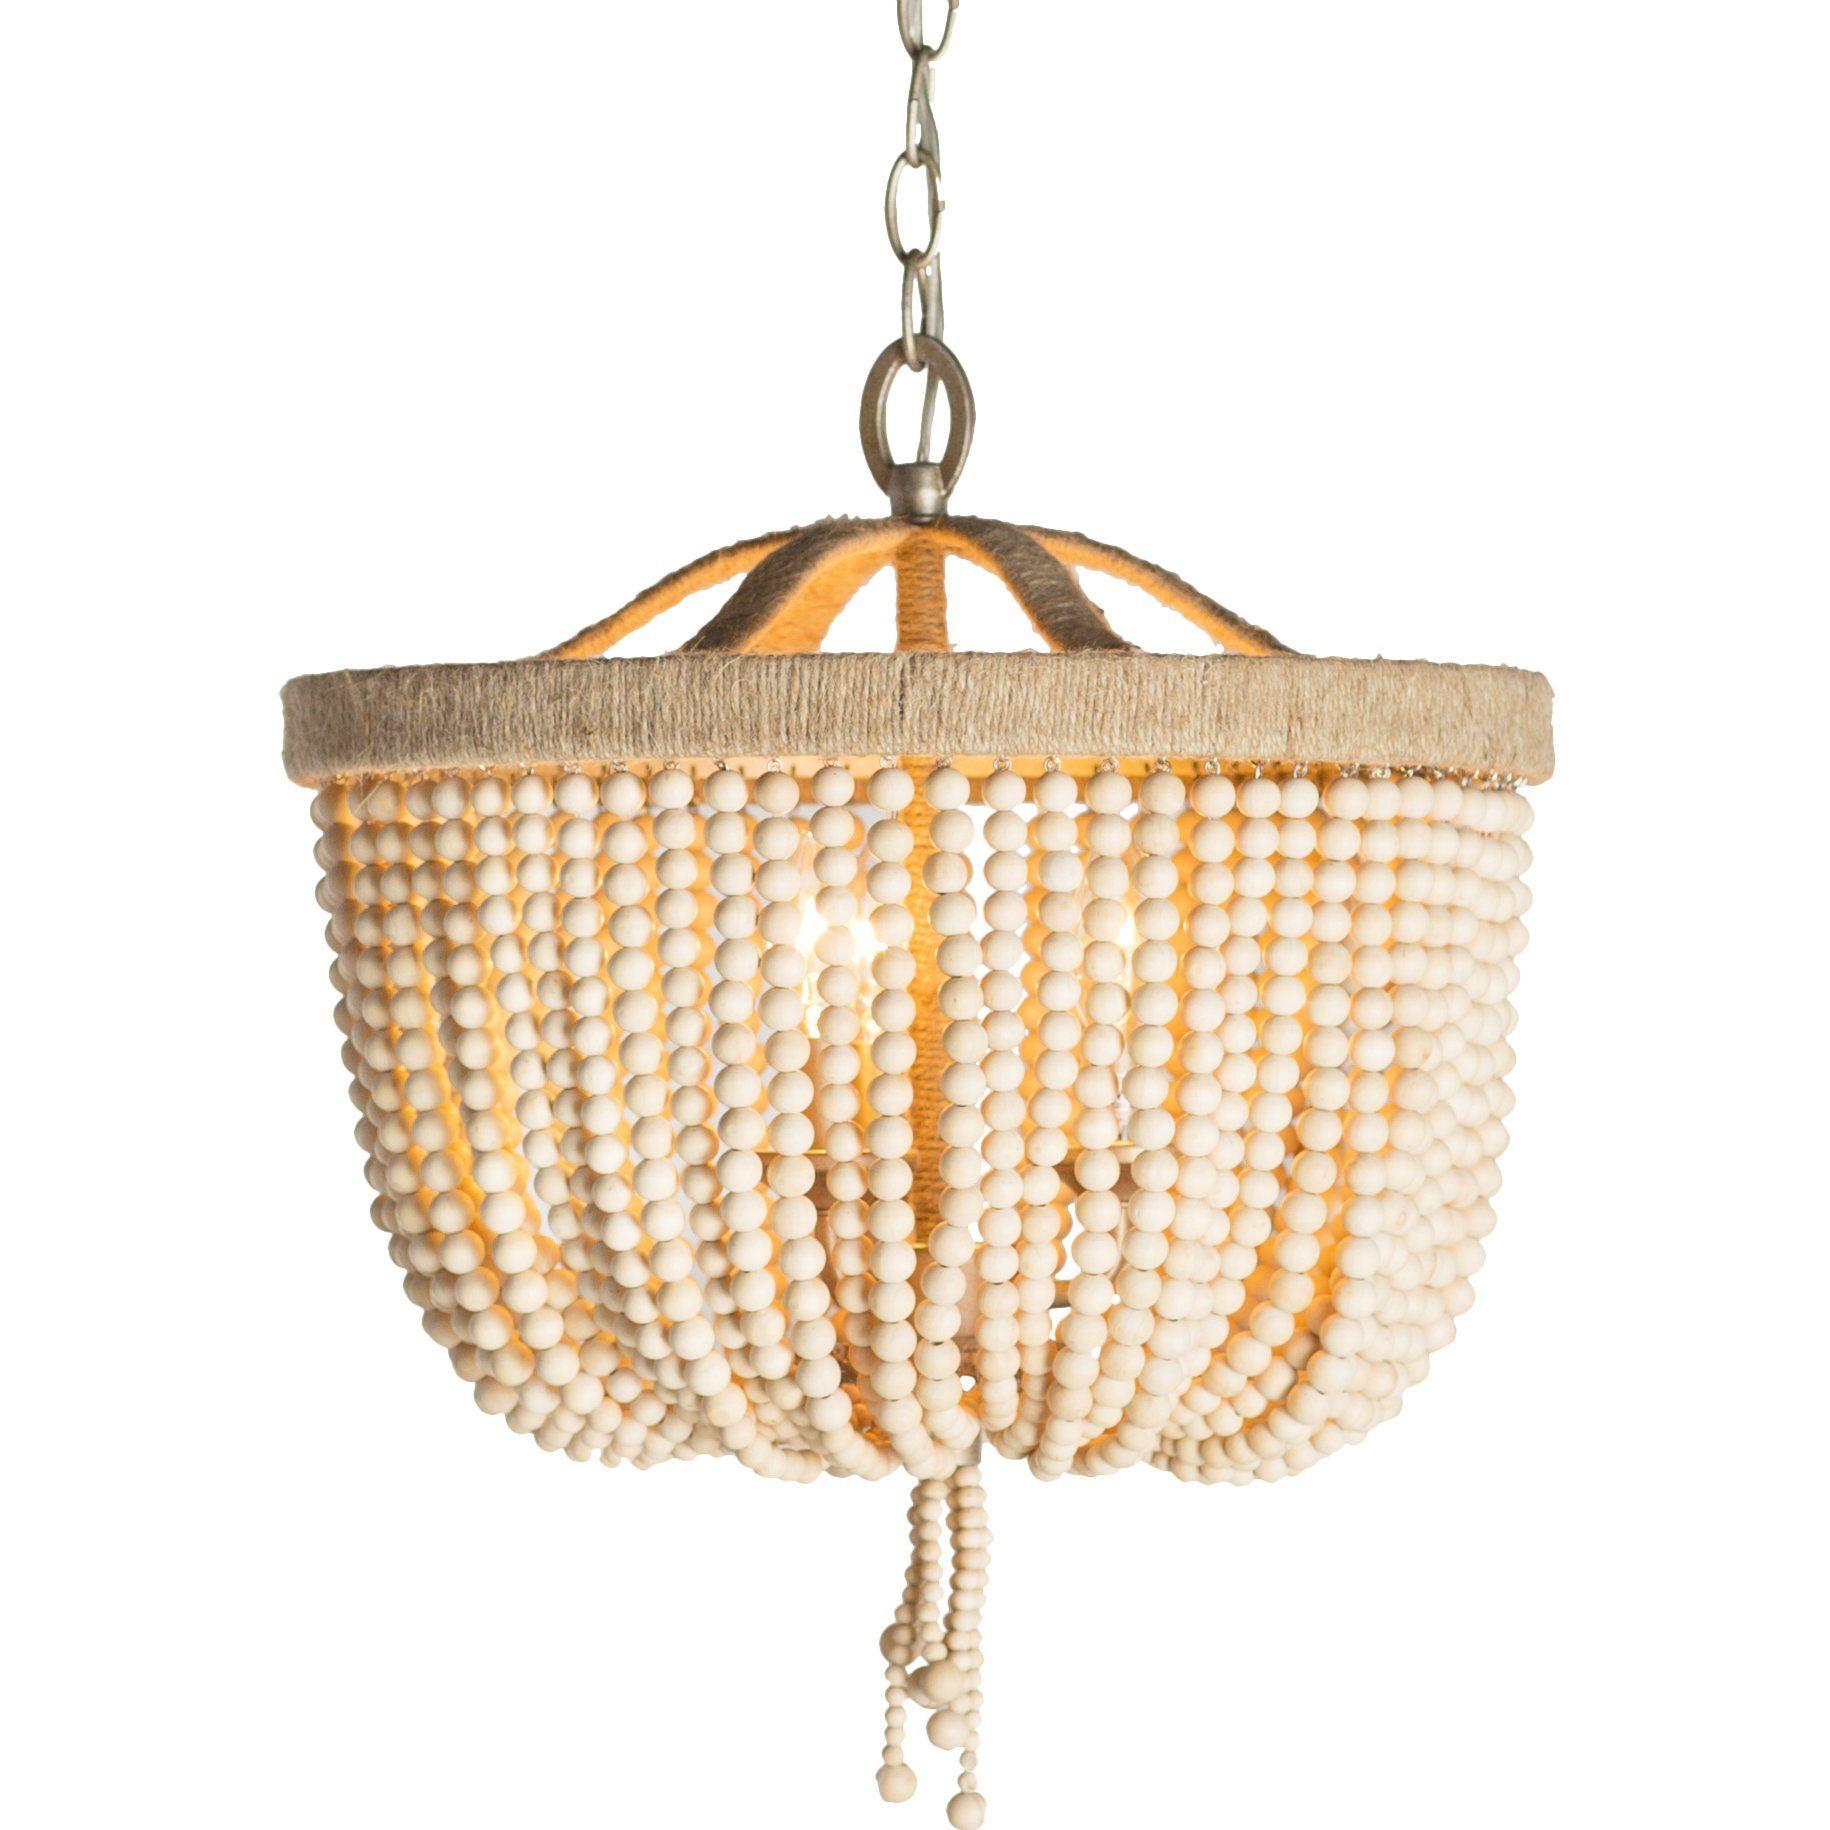 Lark manor girard 3 light mini chandelier lighting pinterest lark manor girard 3 light mini chandelier arubaitofo Choice Image